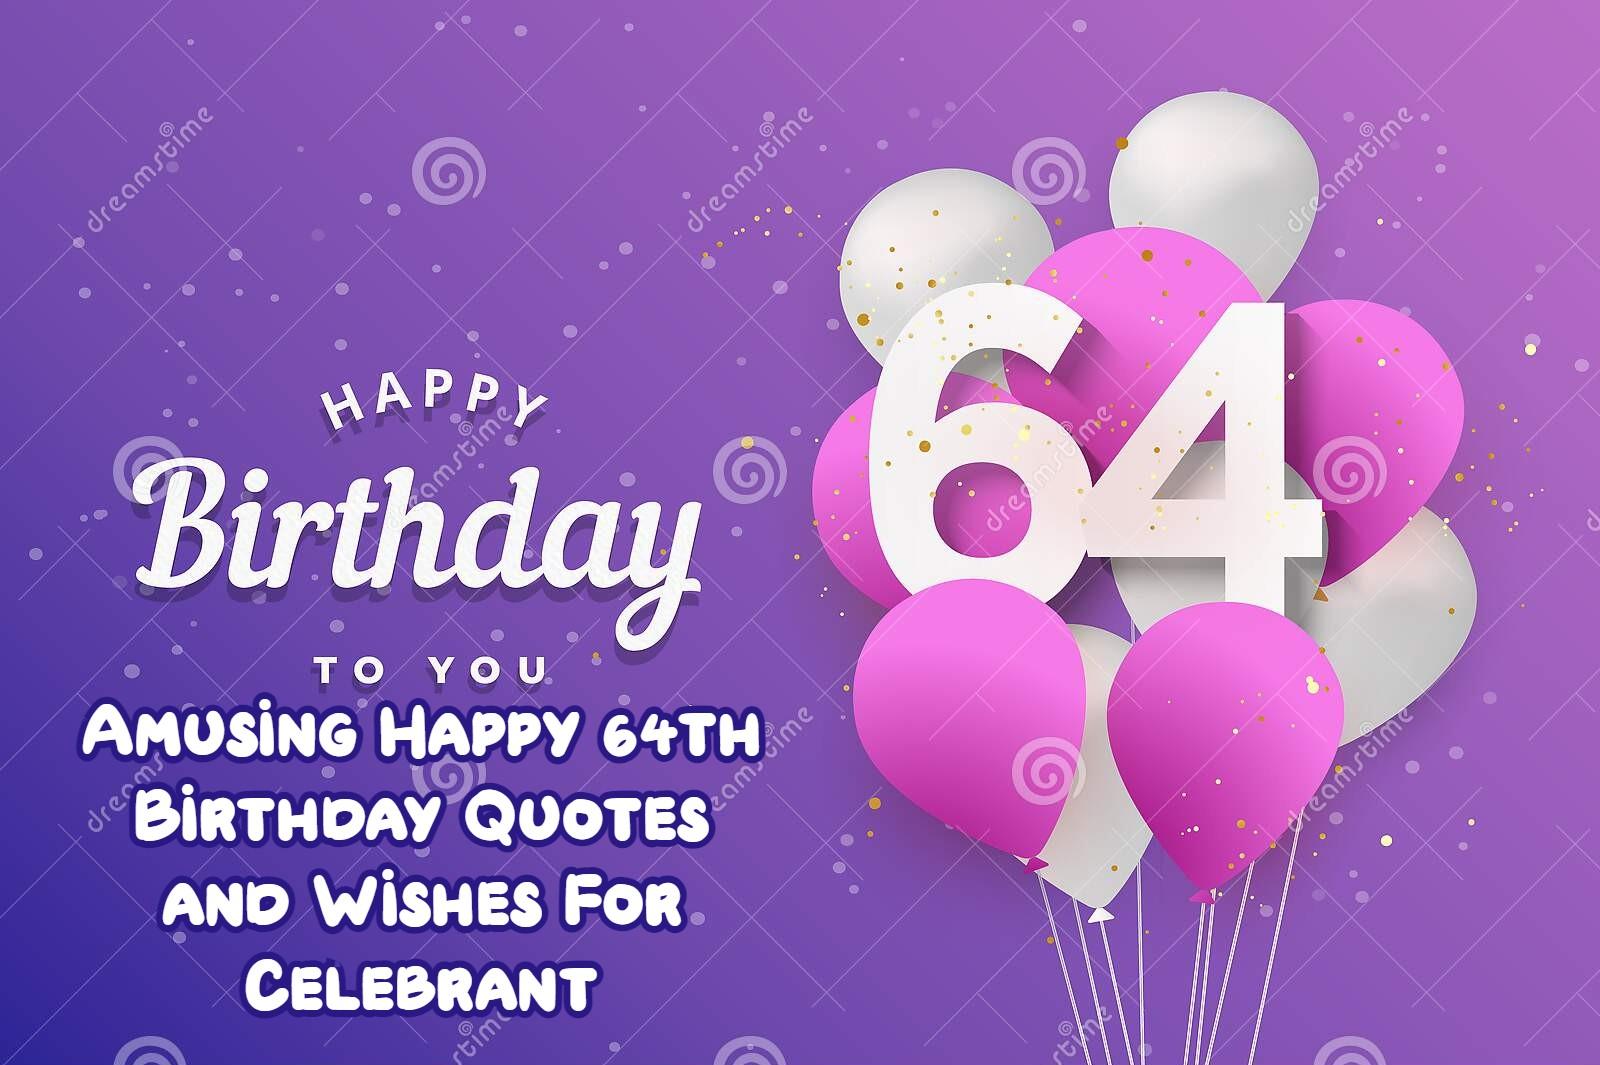 Happy 64th Birthday